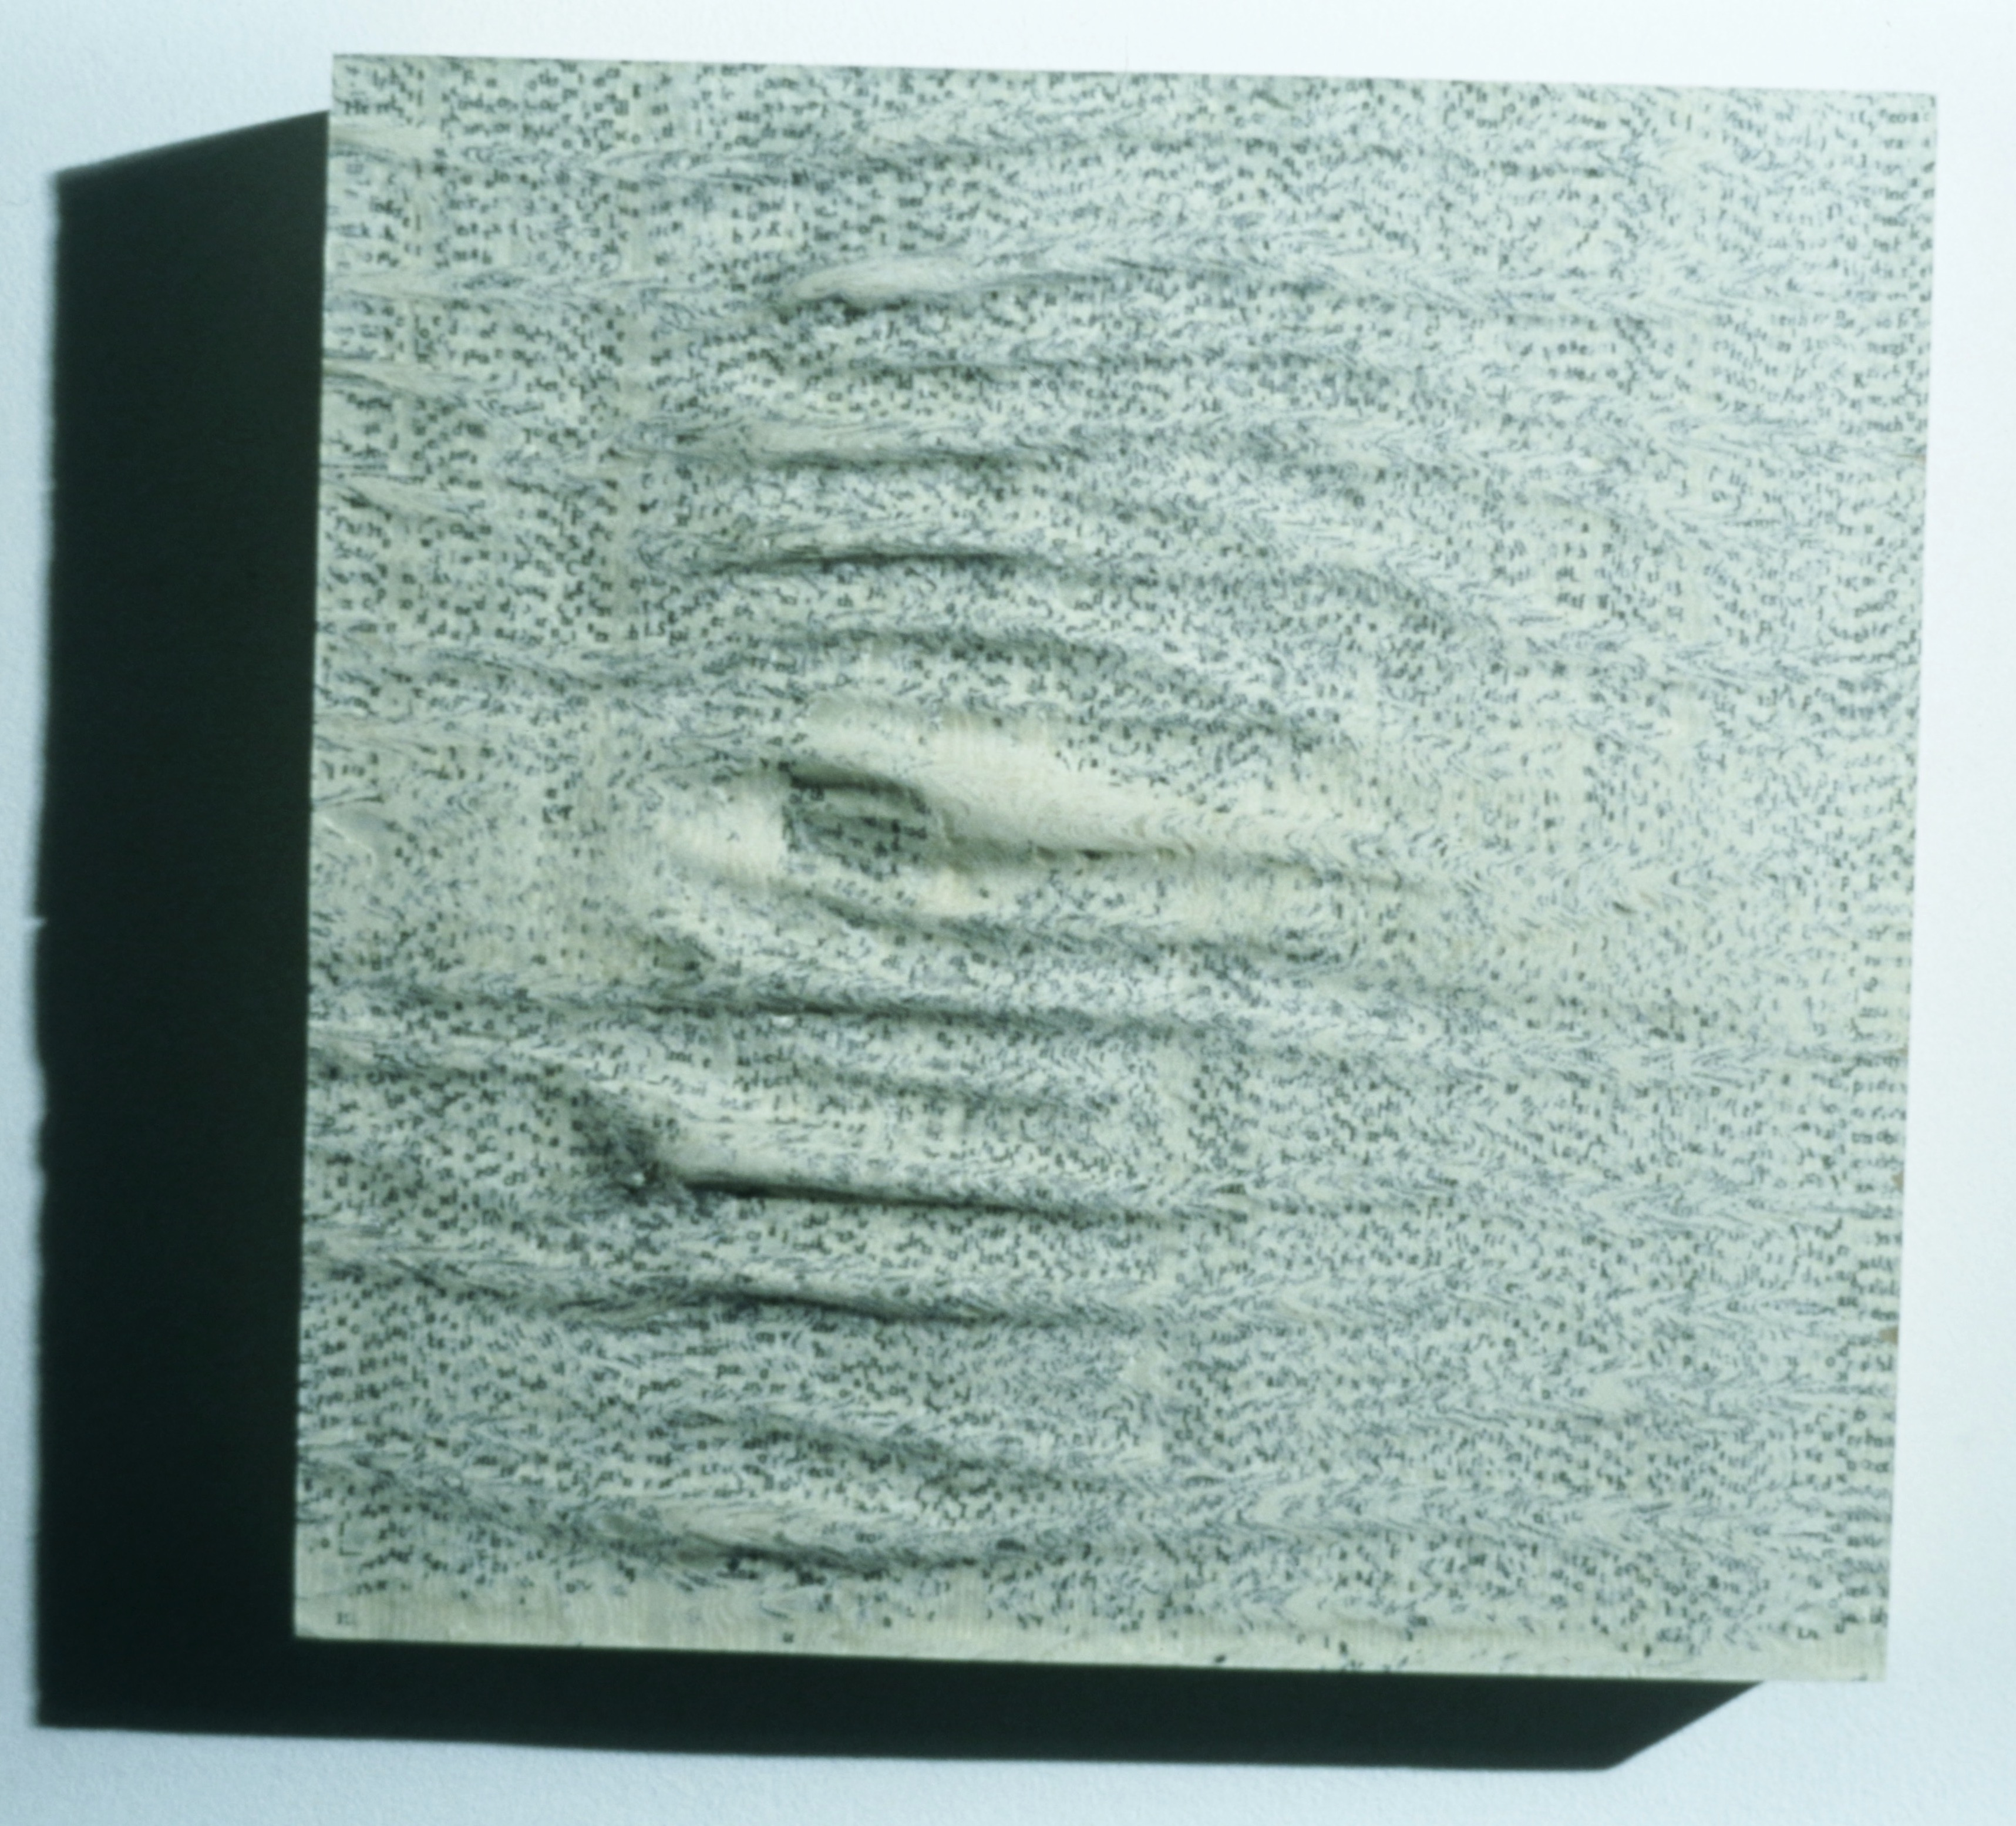 "Misreadings: one novel on wood (1996) 12"" x 12"" x 2.5"""